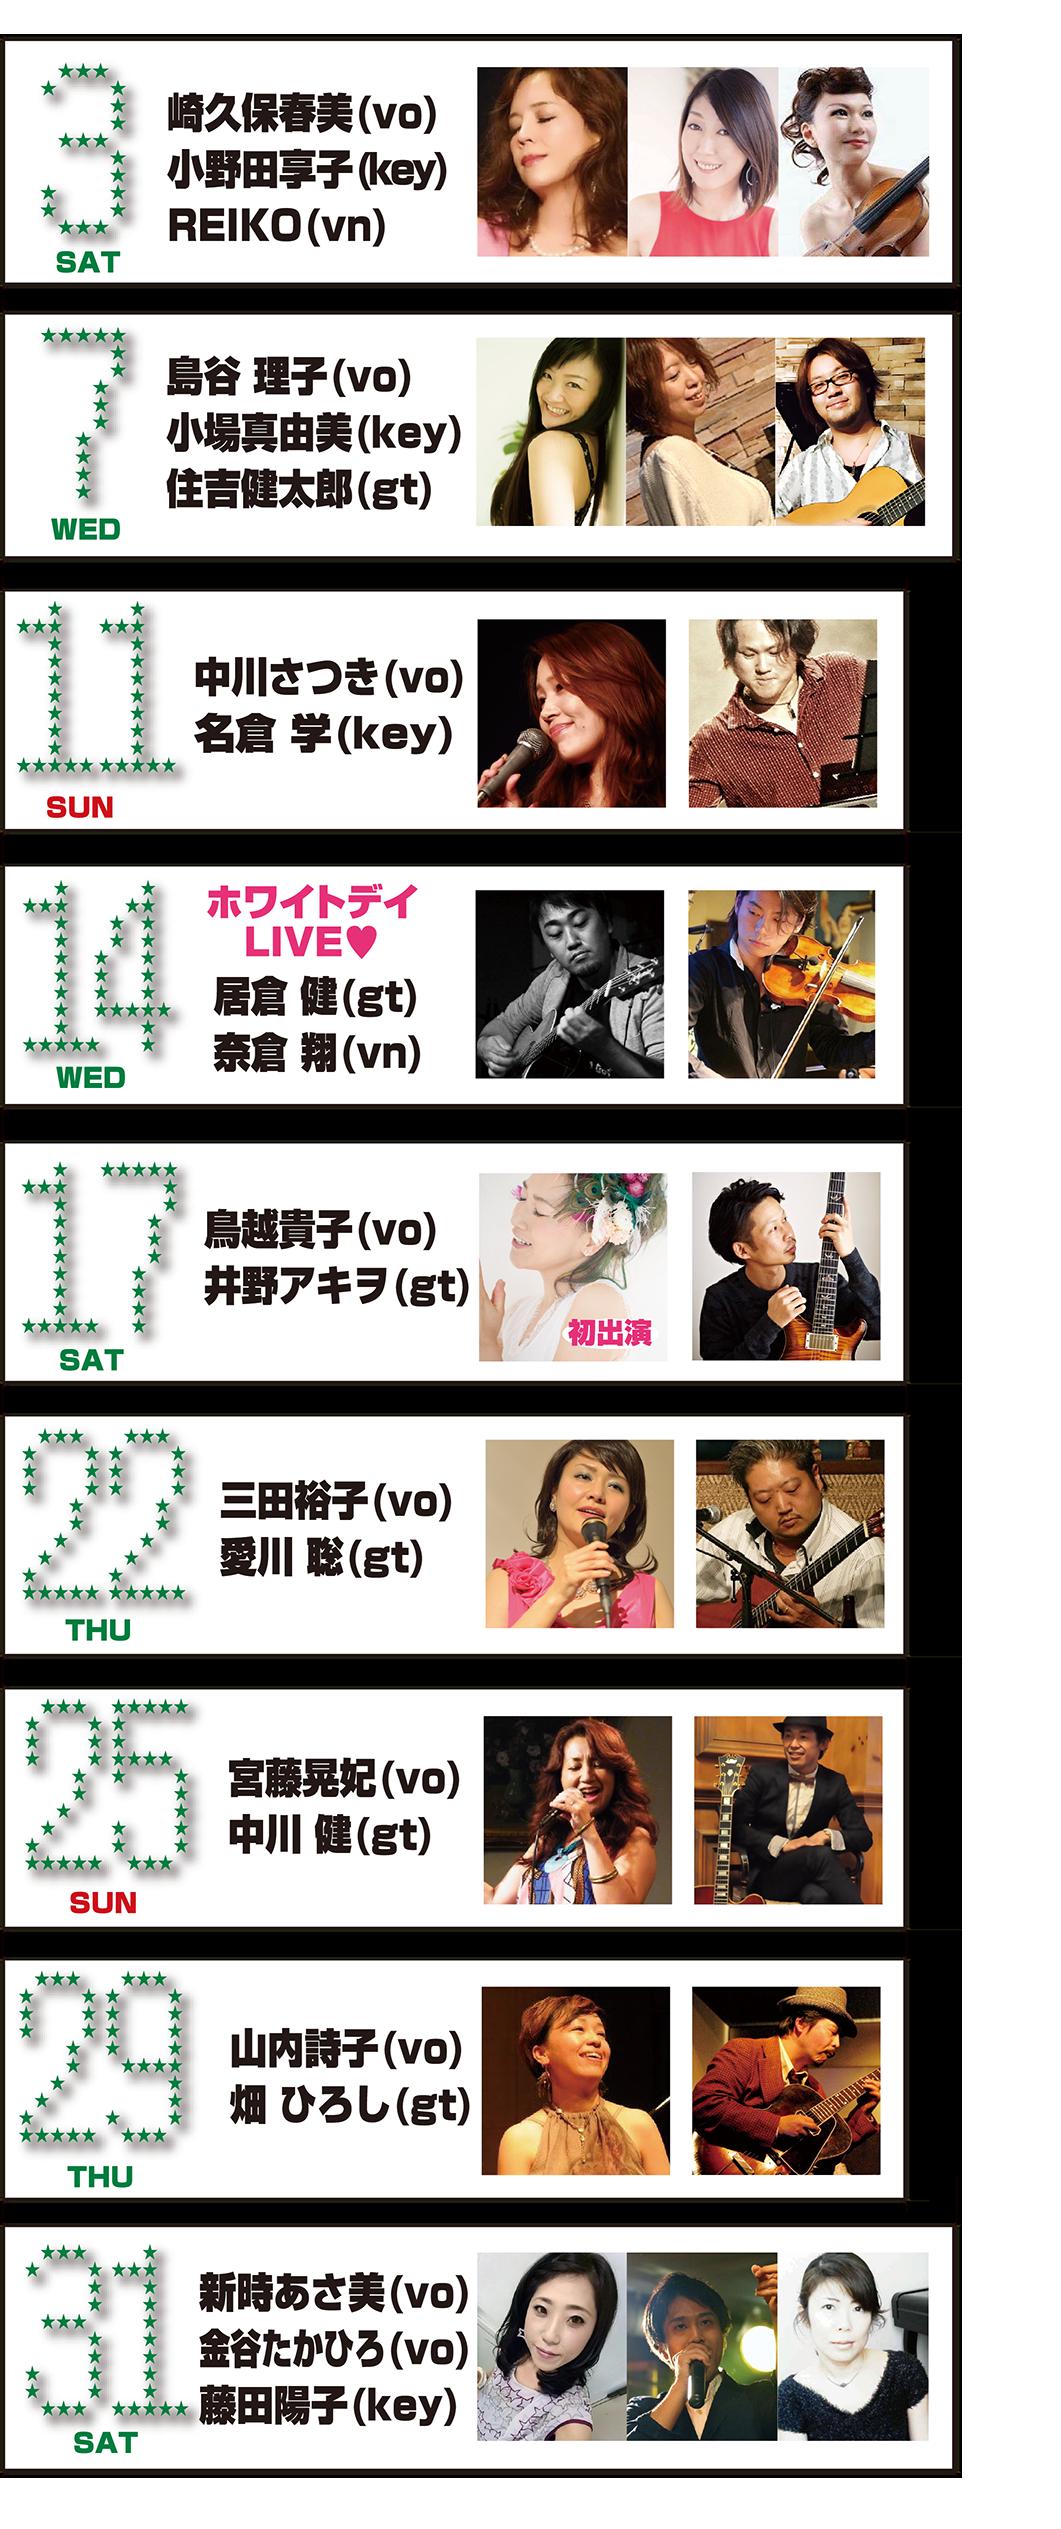 http://kitano-pickup.com/php/images/WEB-3%E6%9C%88.png